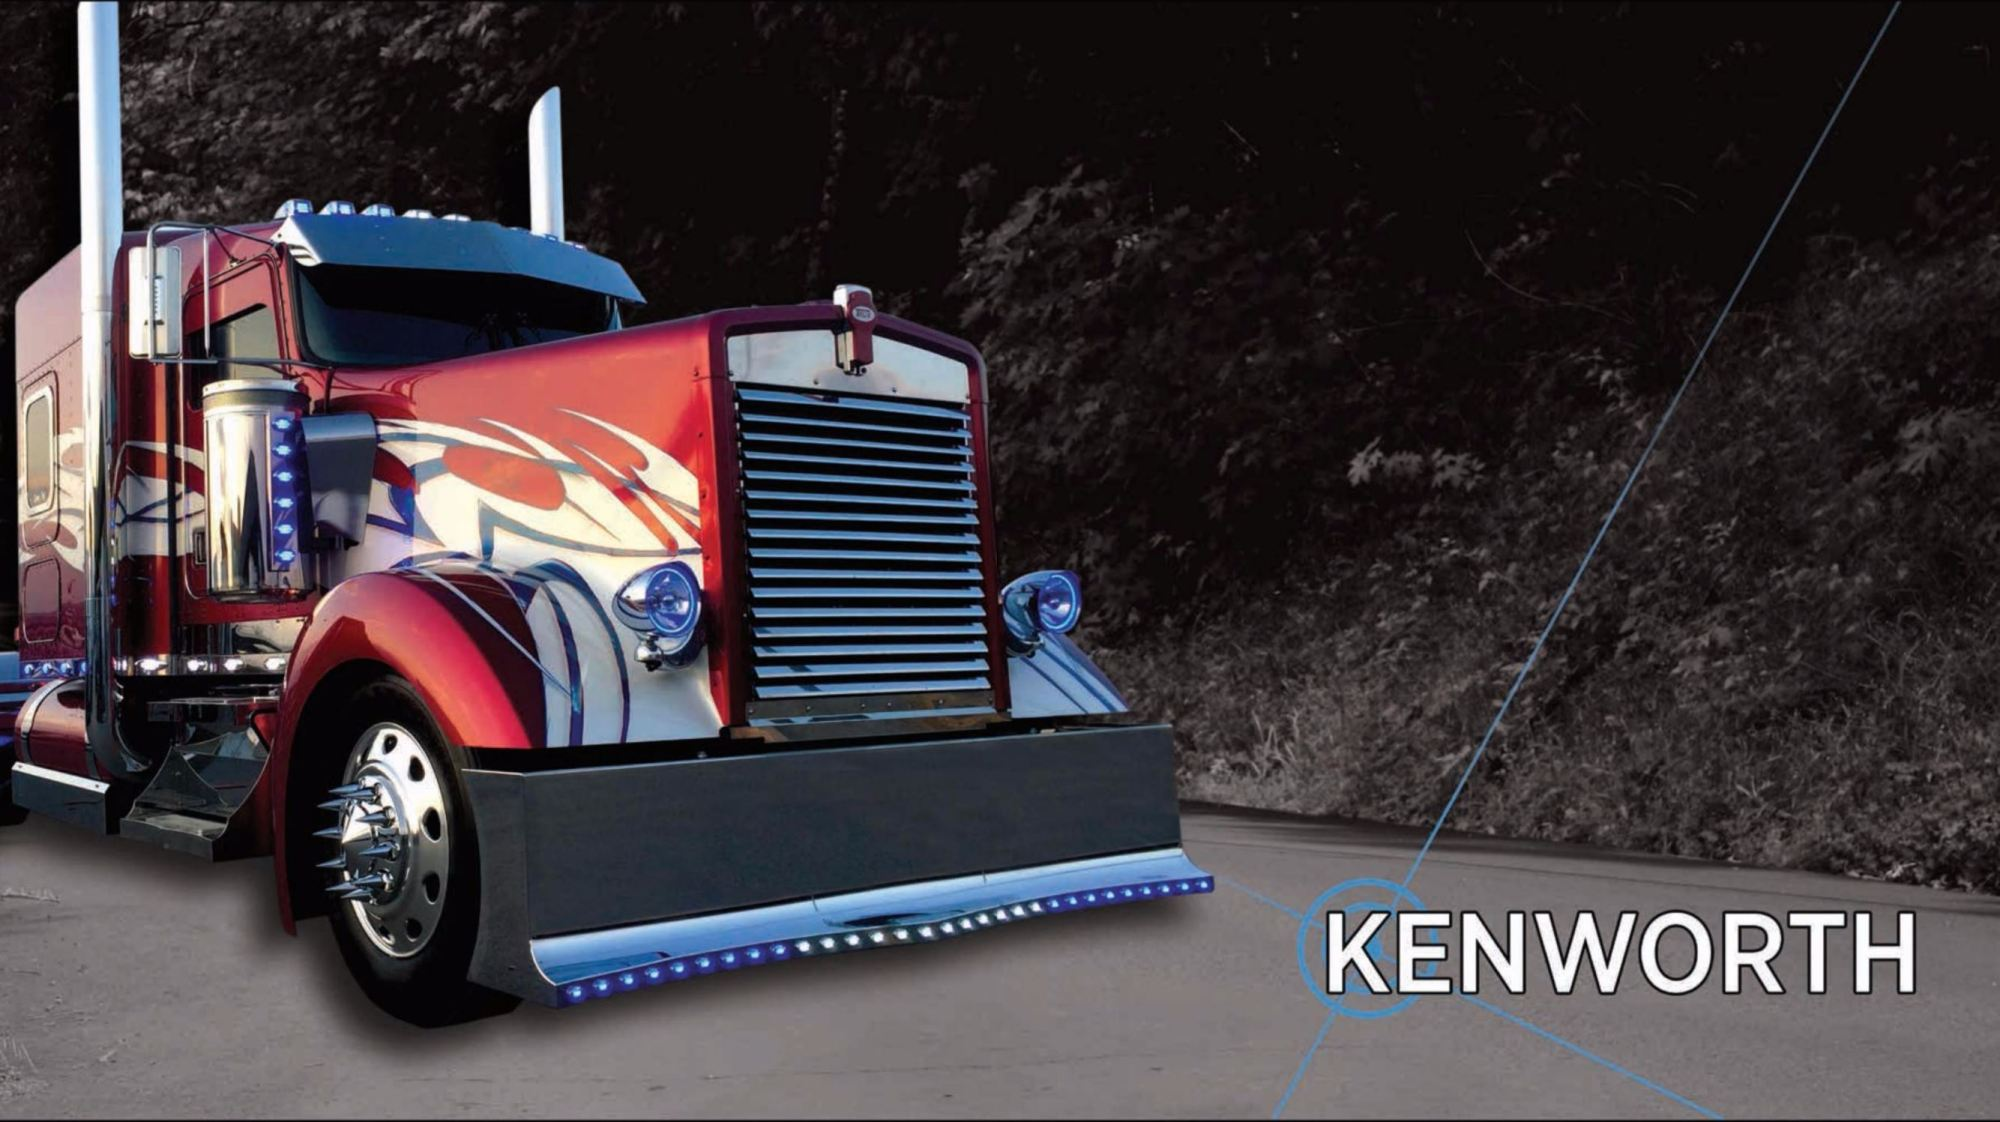 hight resolution of kenworth truck picture jpg